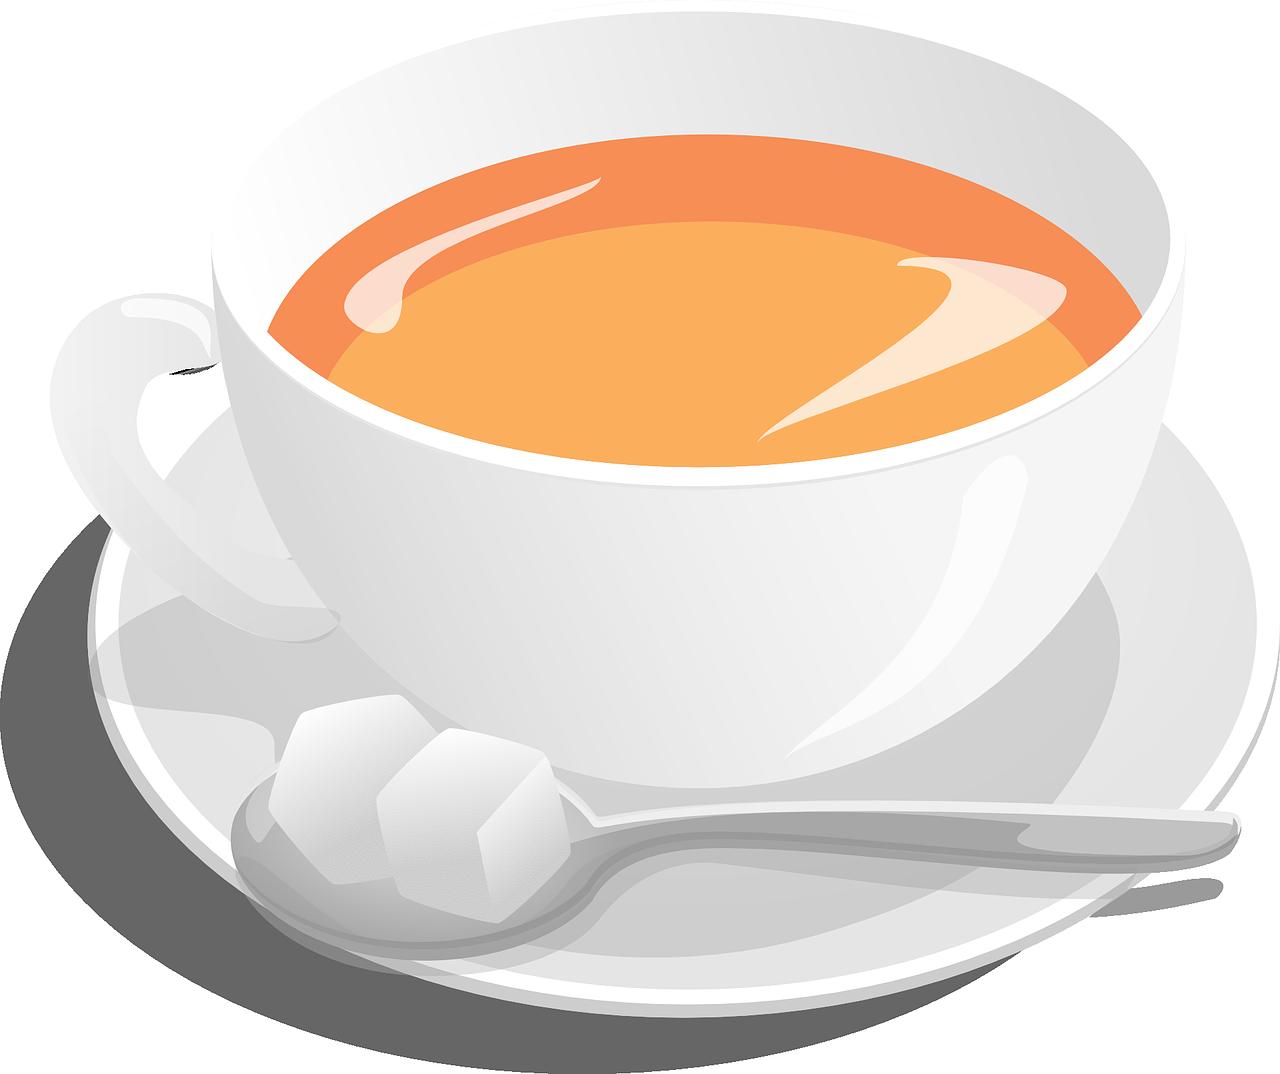 Tea 153336 1280